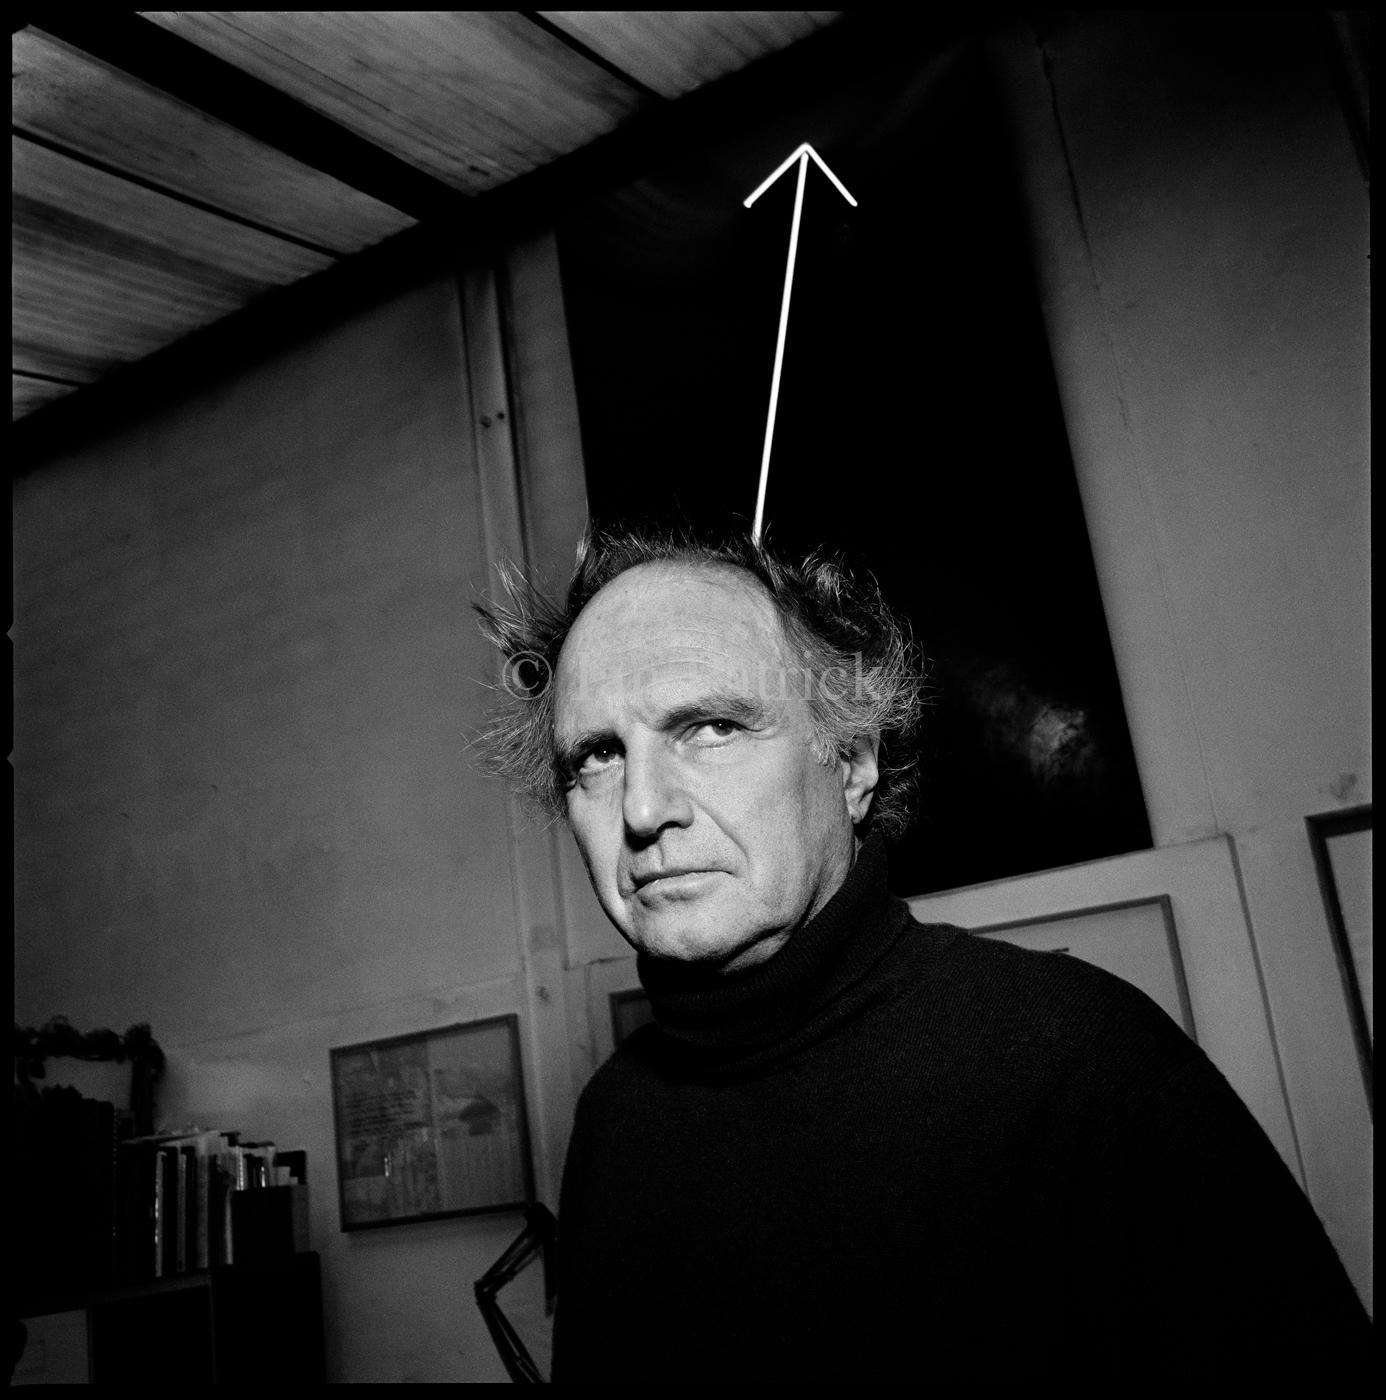 PIOTRE KOWALSKI ARTIST